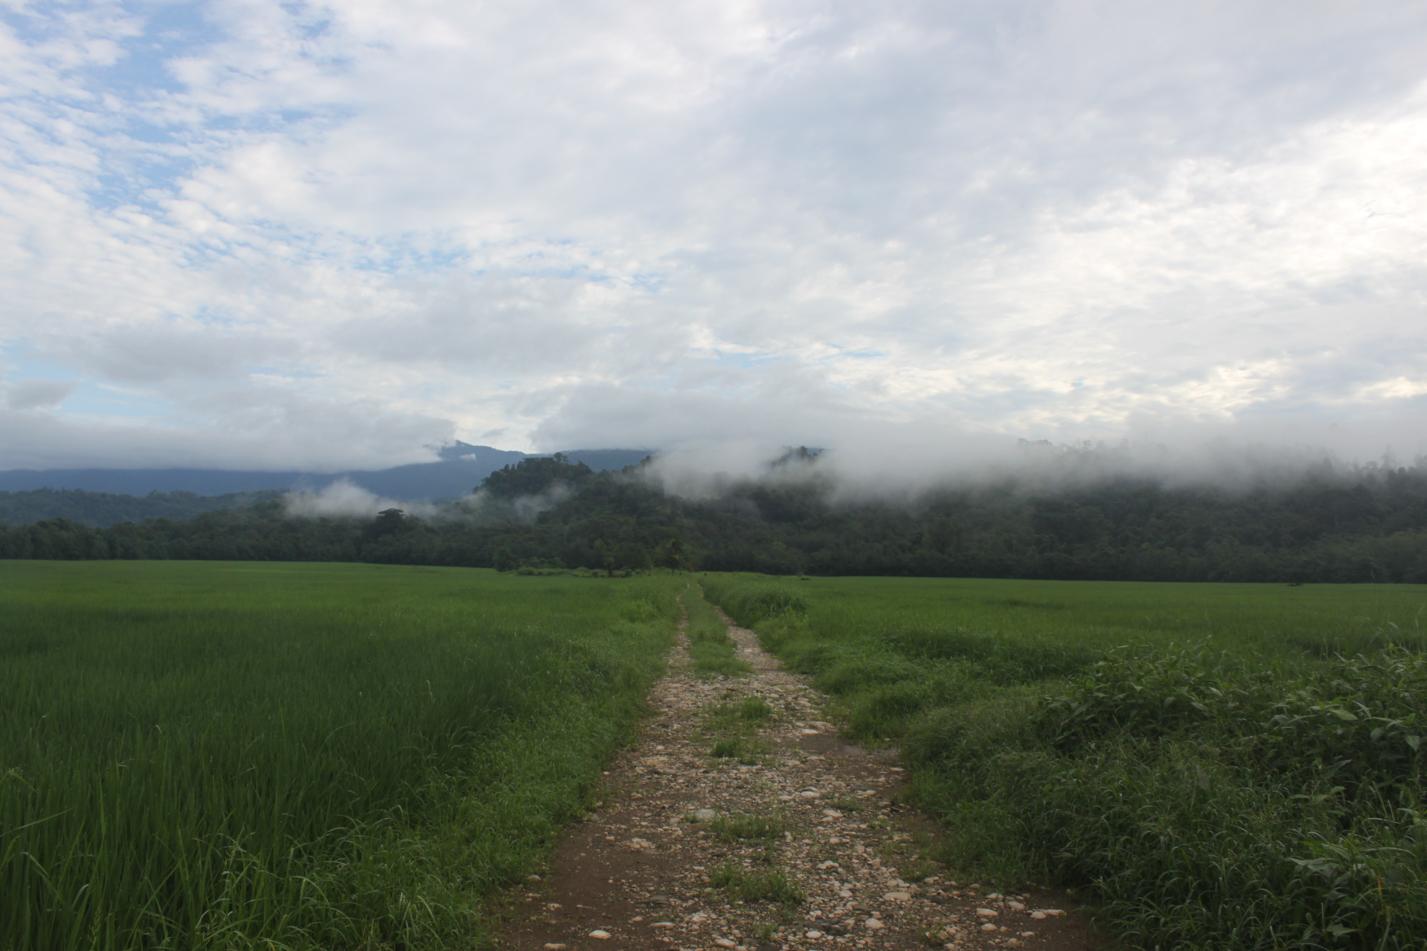 Mystisches Morgenpanorama an unserem letzten Tag in Costa Rica.